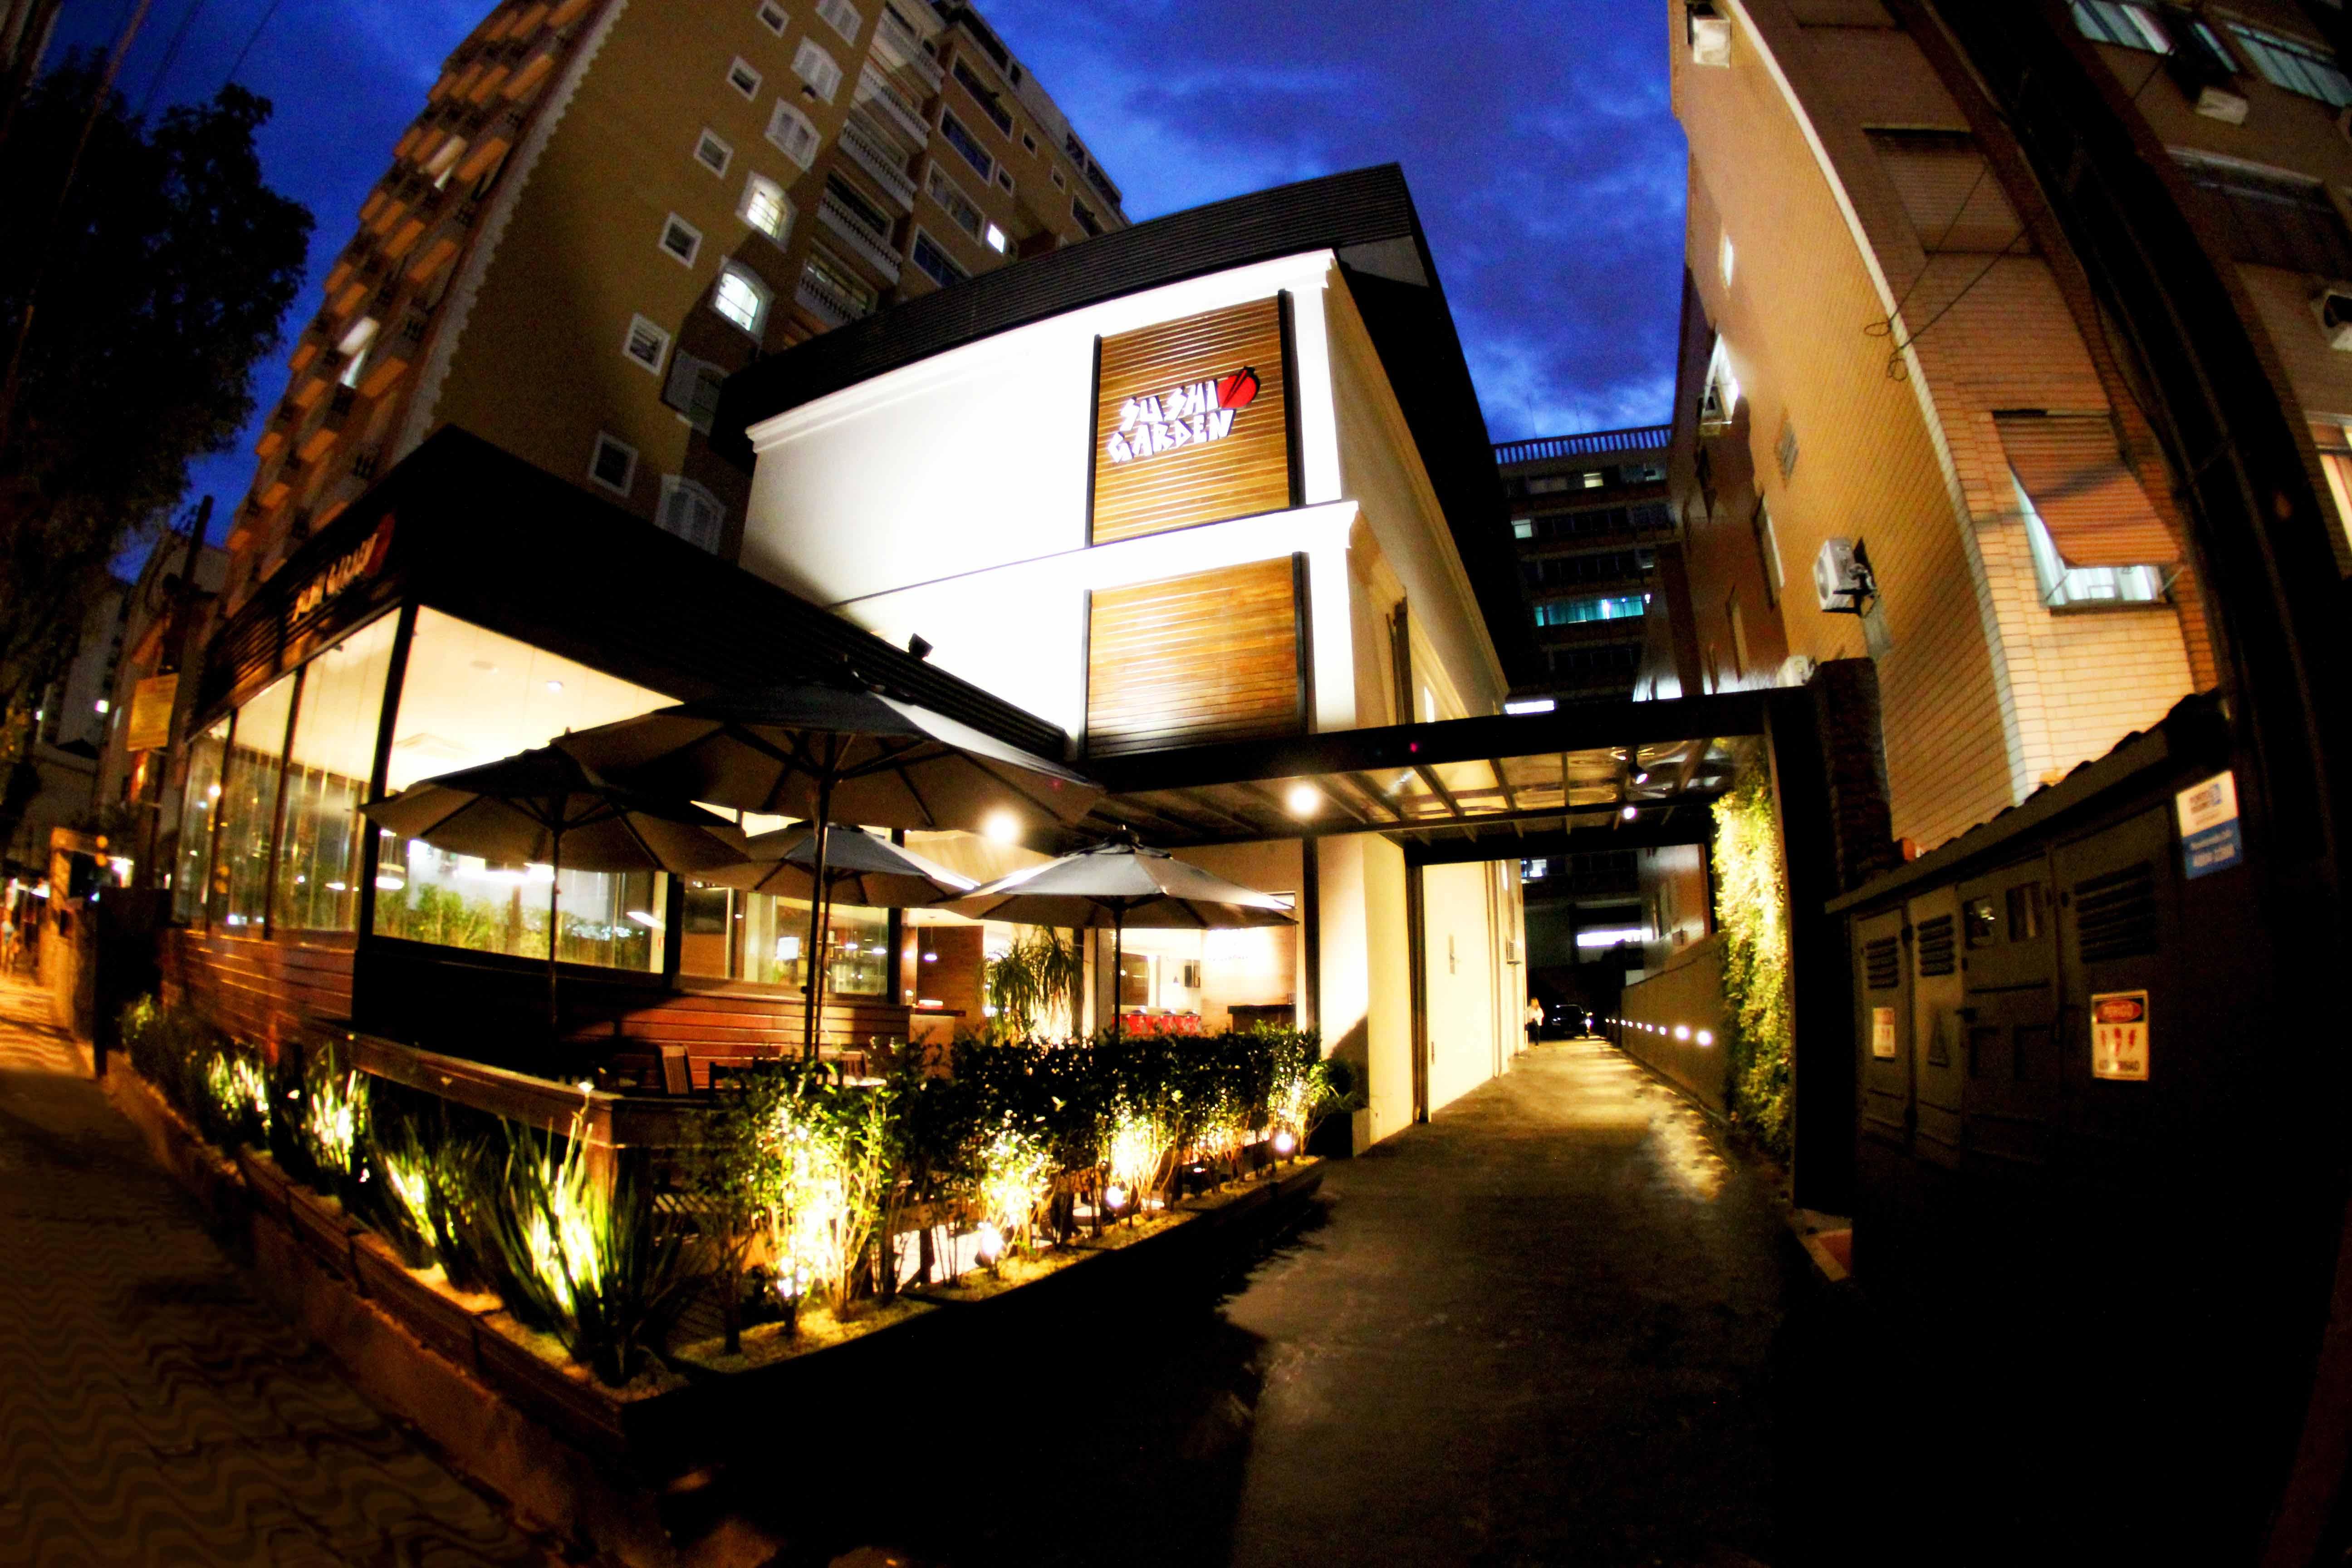 01-Sushi-Garden-restaurante-japones-arquitetura-design-mazzark